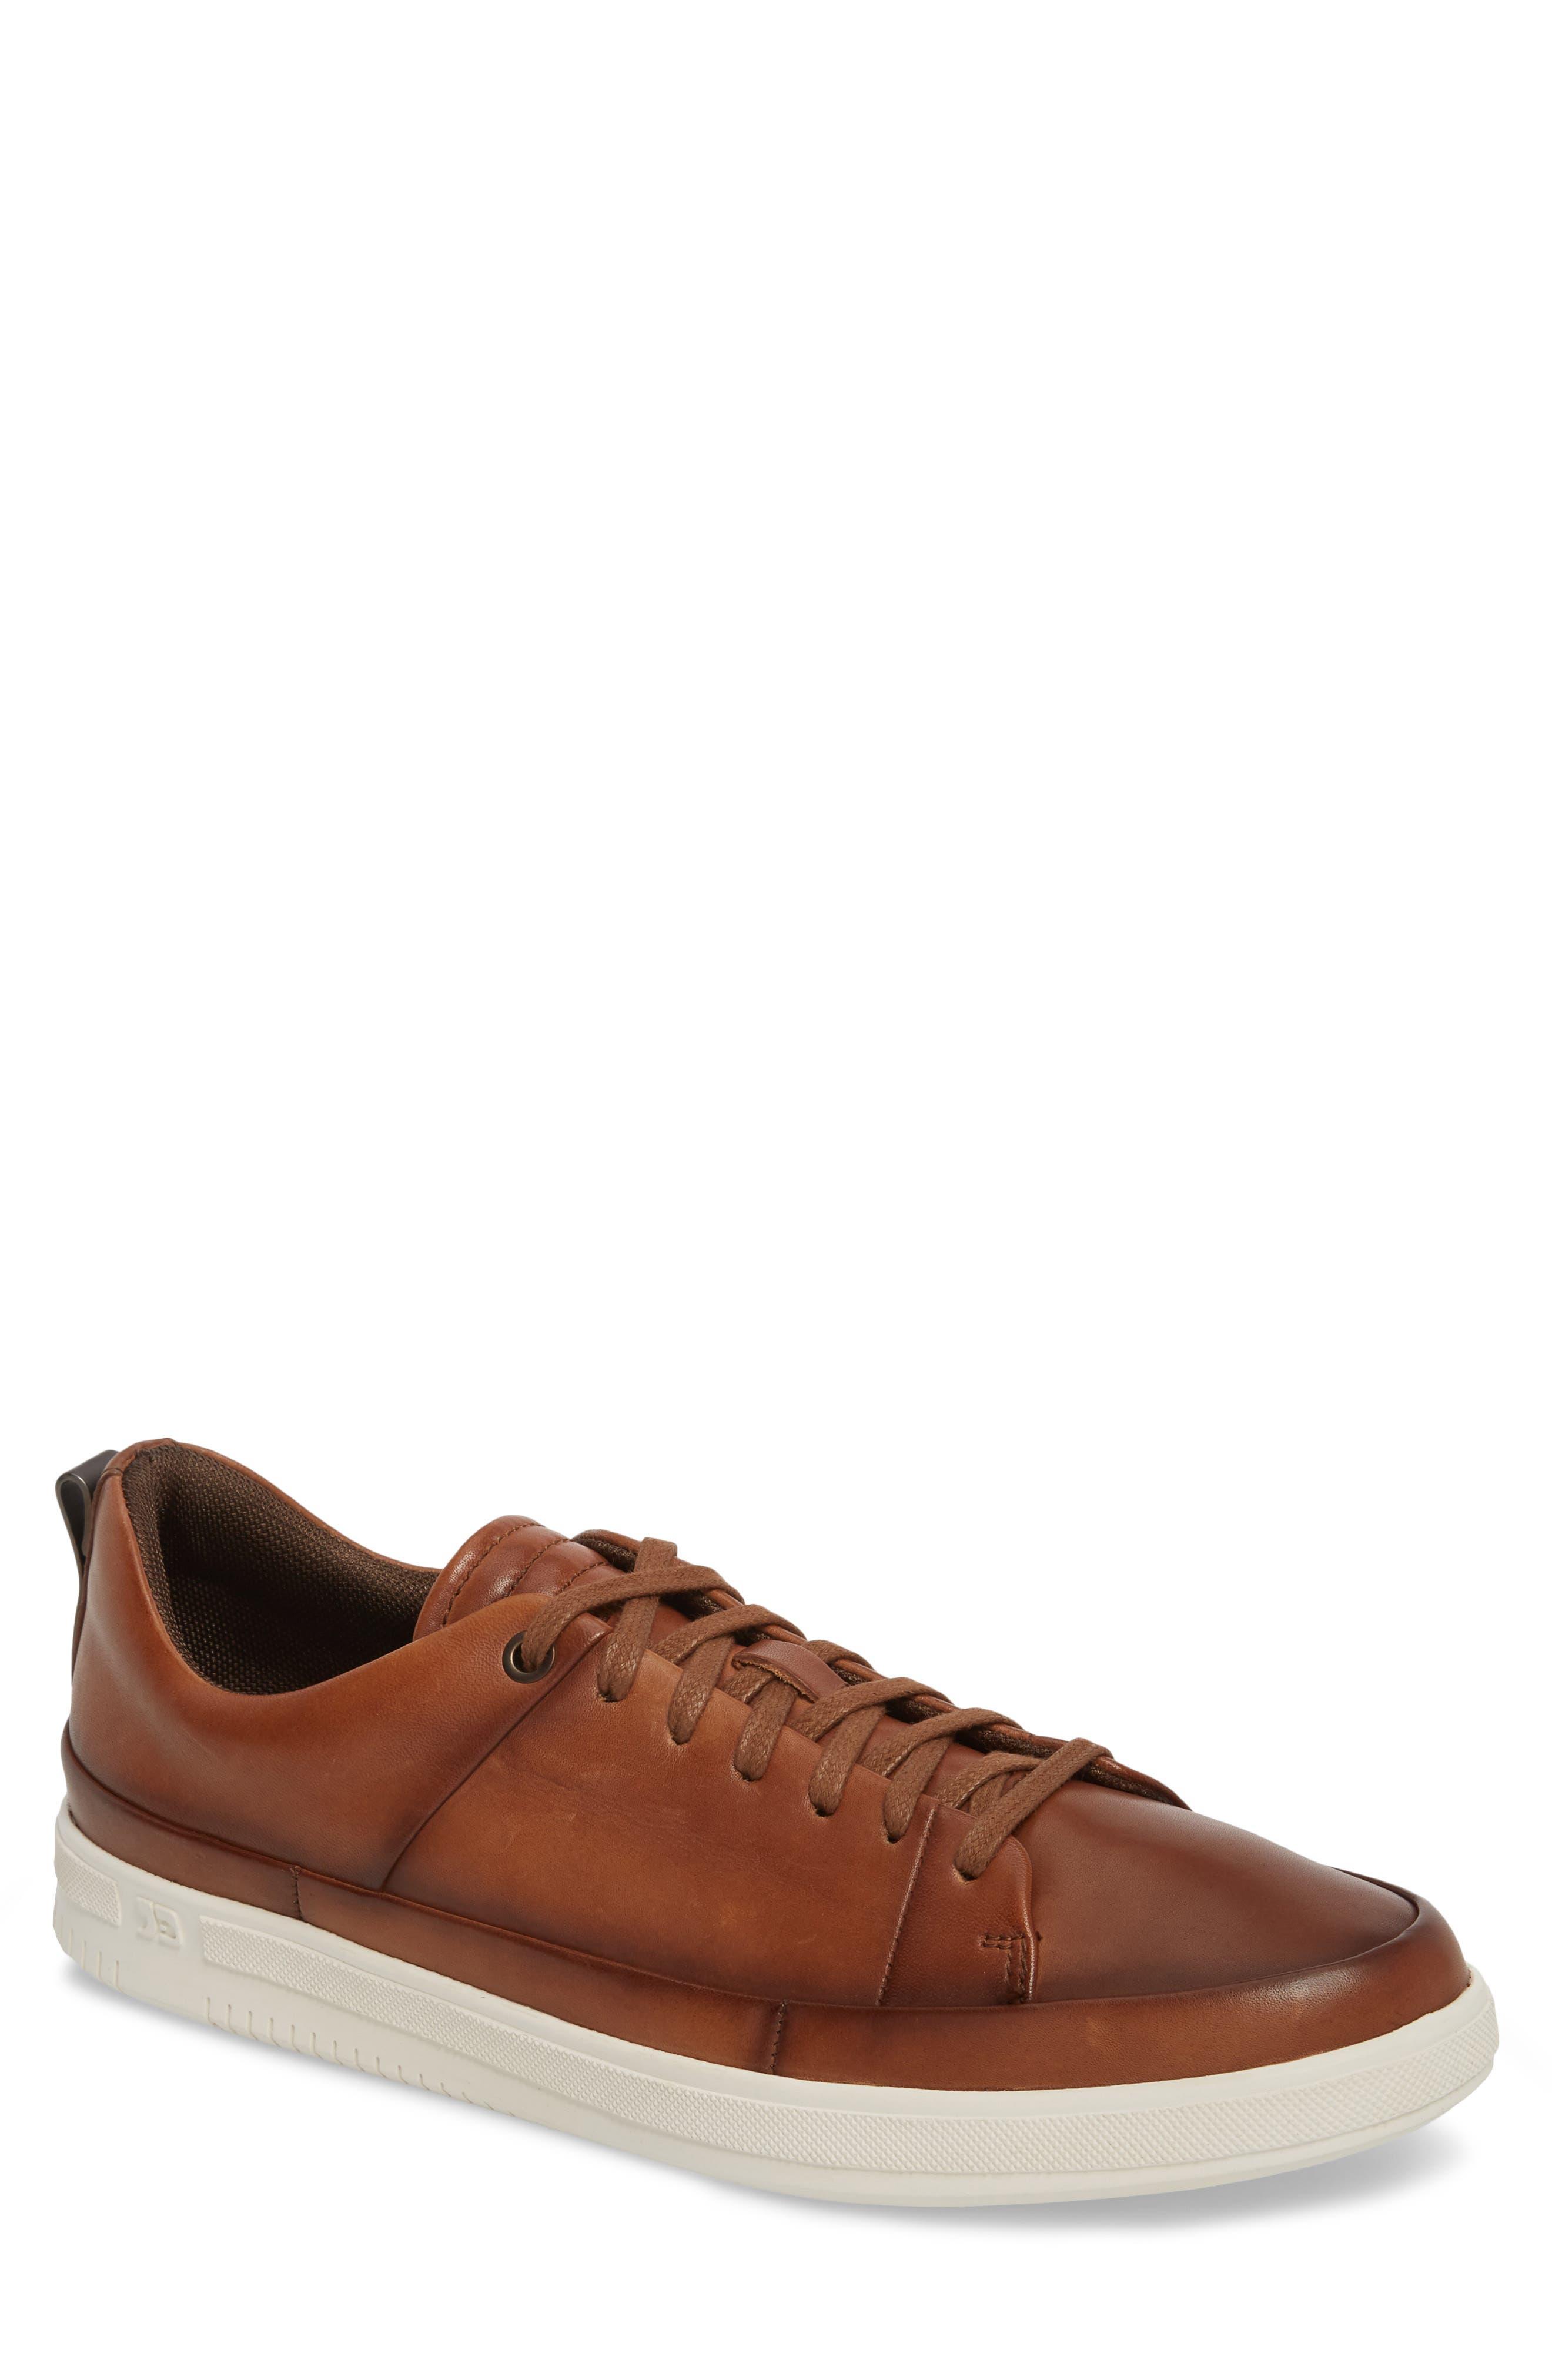 Joe's Joe Slick Sneaker (Men)